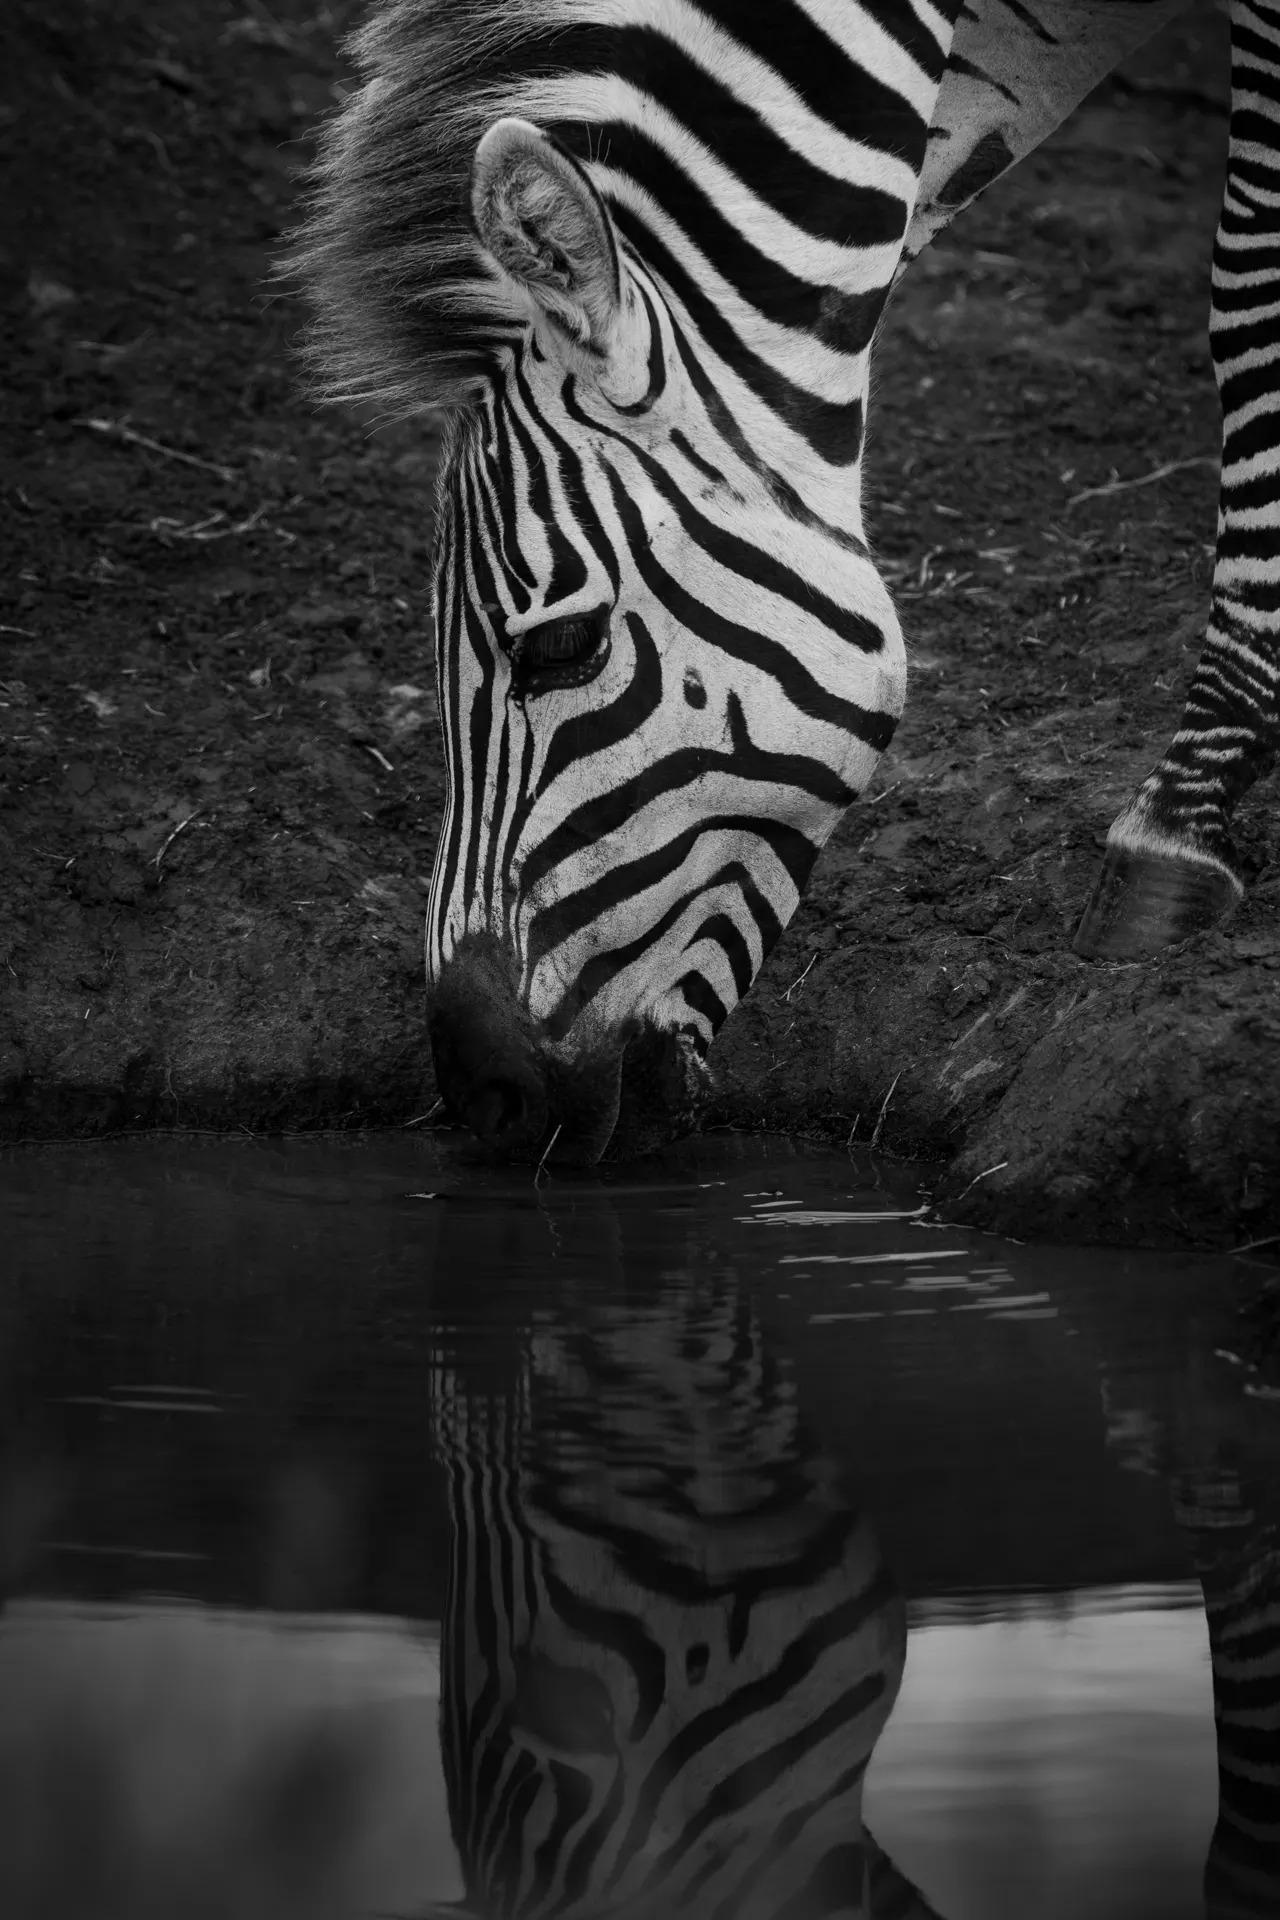 Zebra drinks